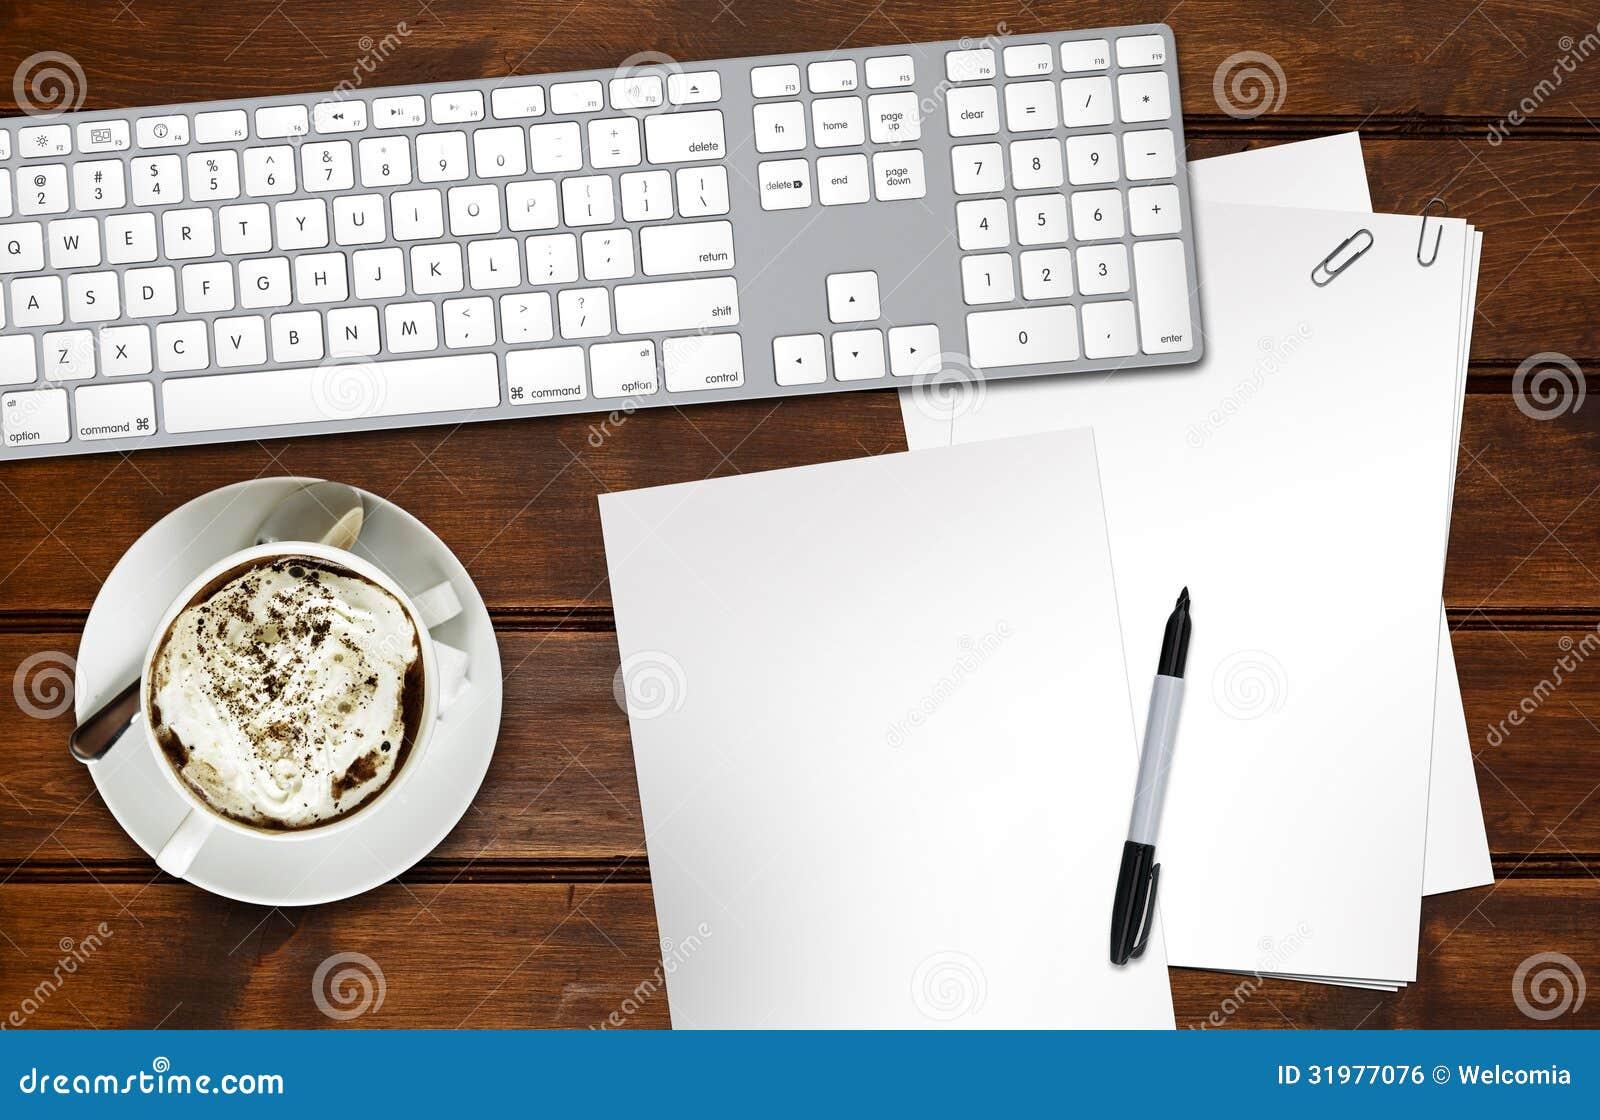 Designer Desk Royalty Free Stock Image - Image: 31977076